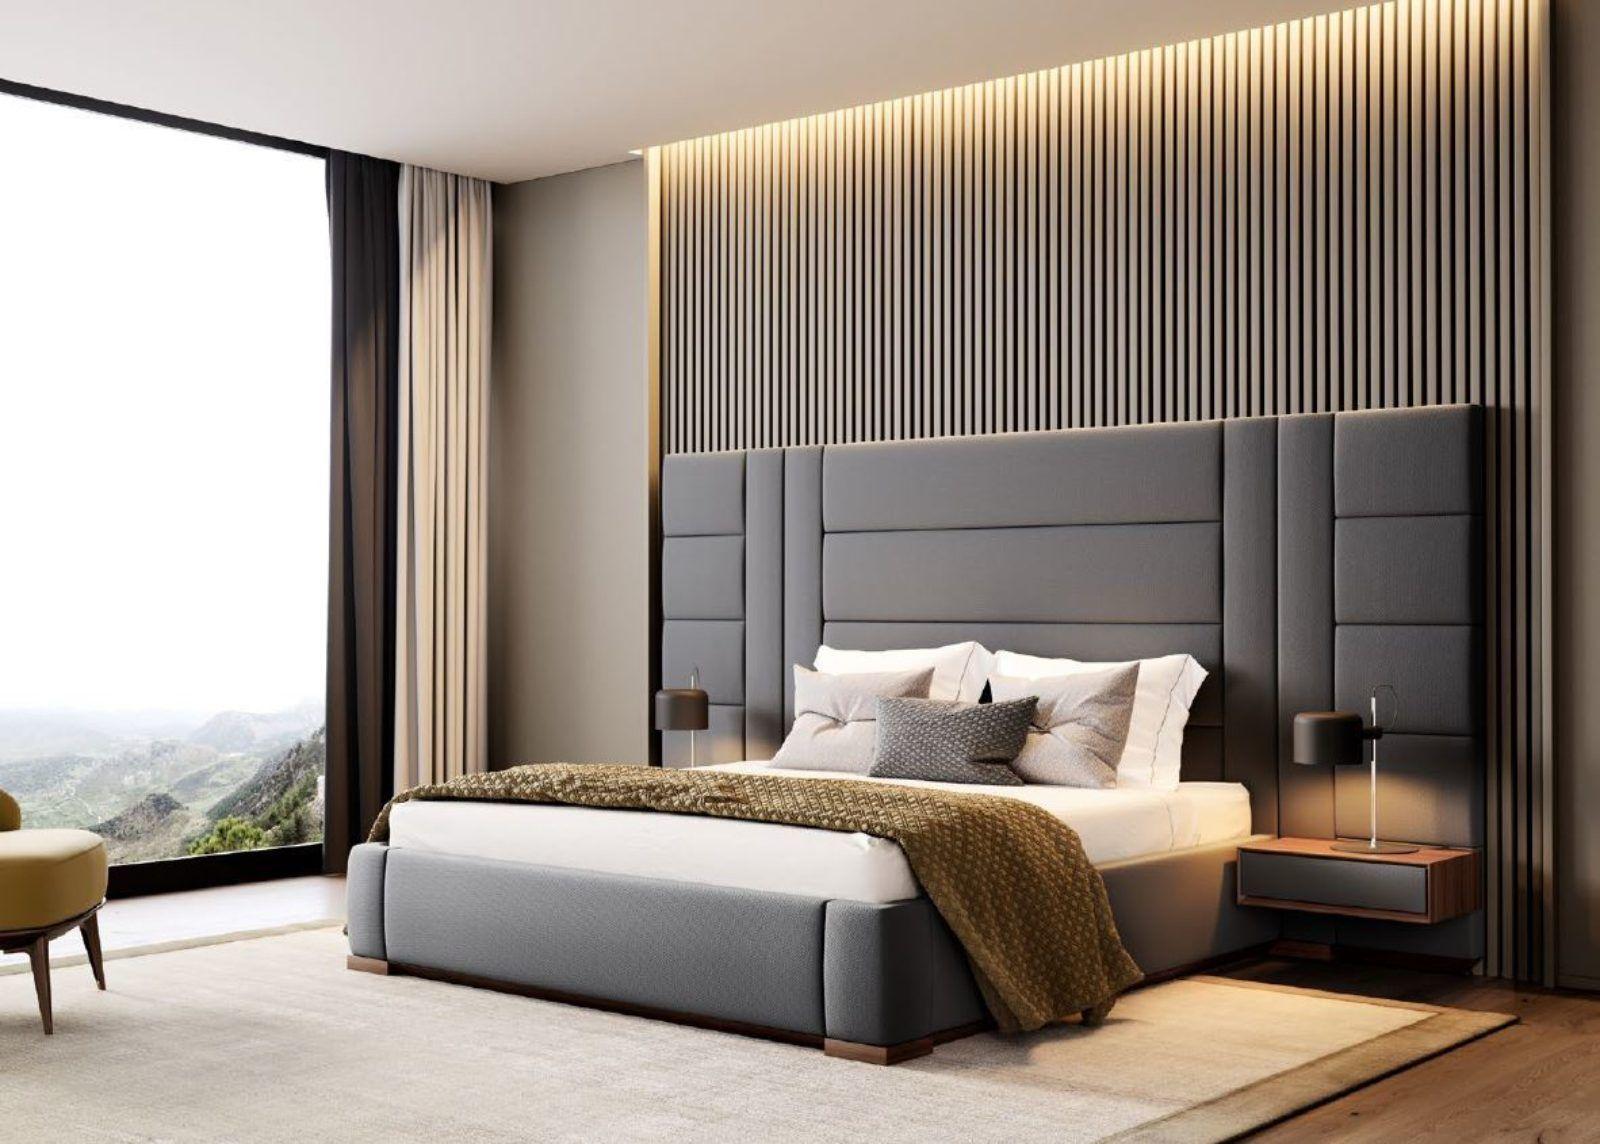 contemporary bedroom interior design that very cozy 04 on modern cozy bedroom decorating ideas id=78471